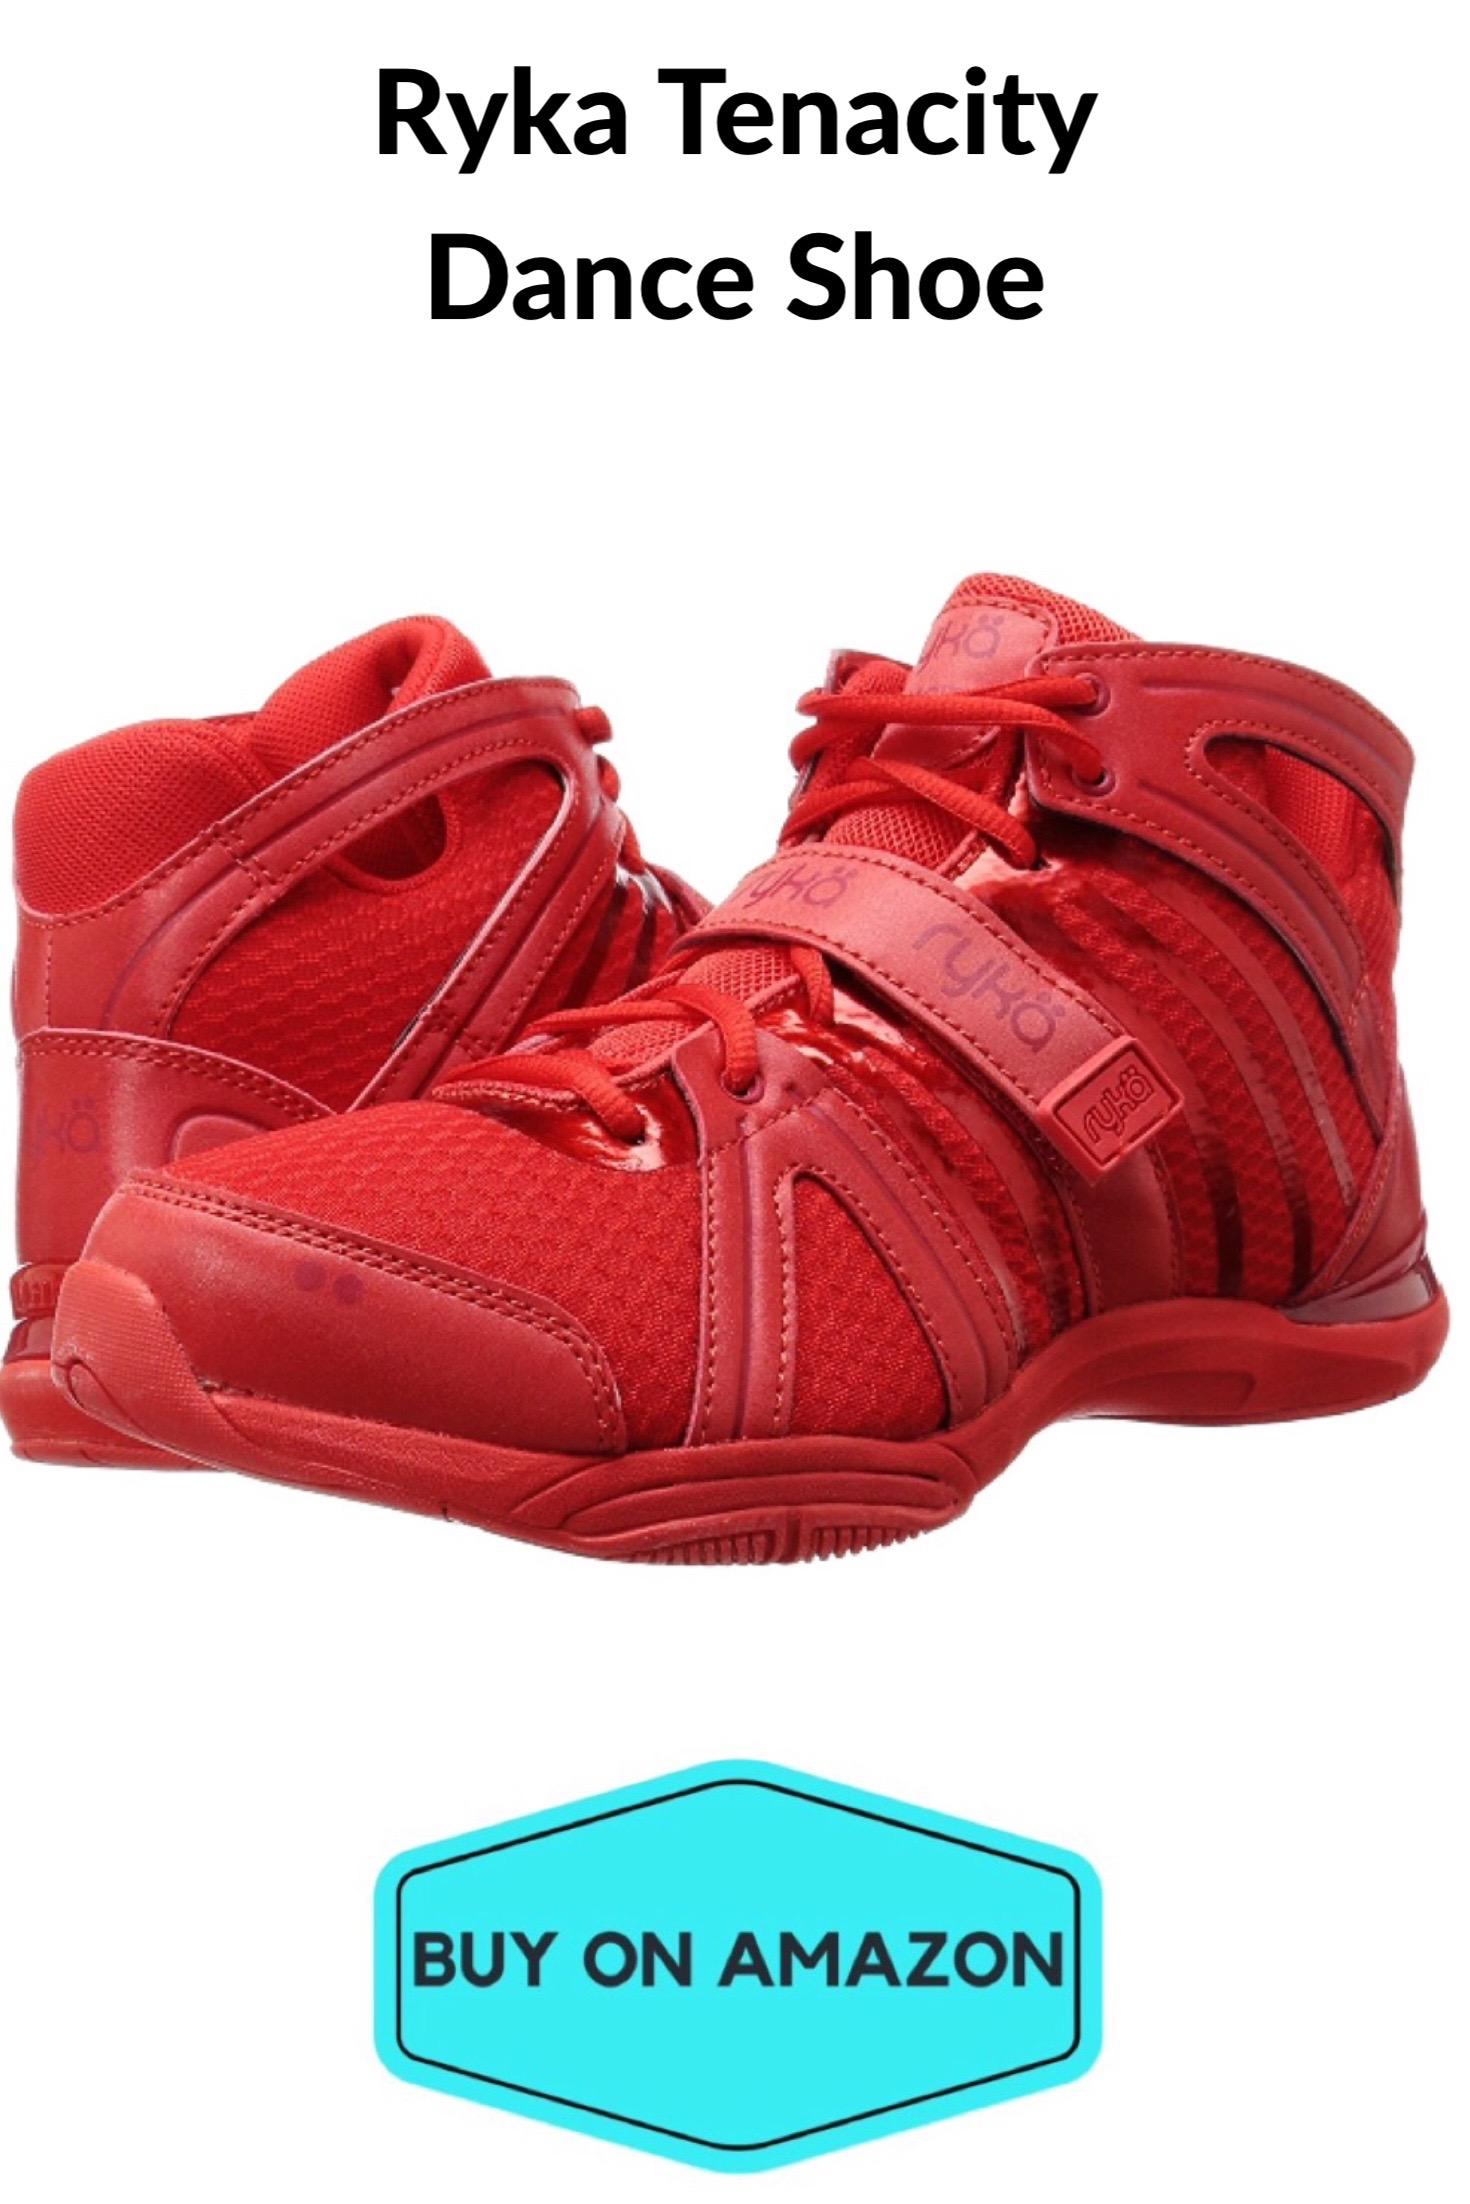 Ryka Tenacity Women's Dance Shoe